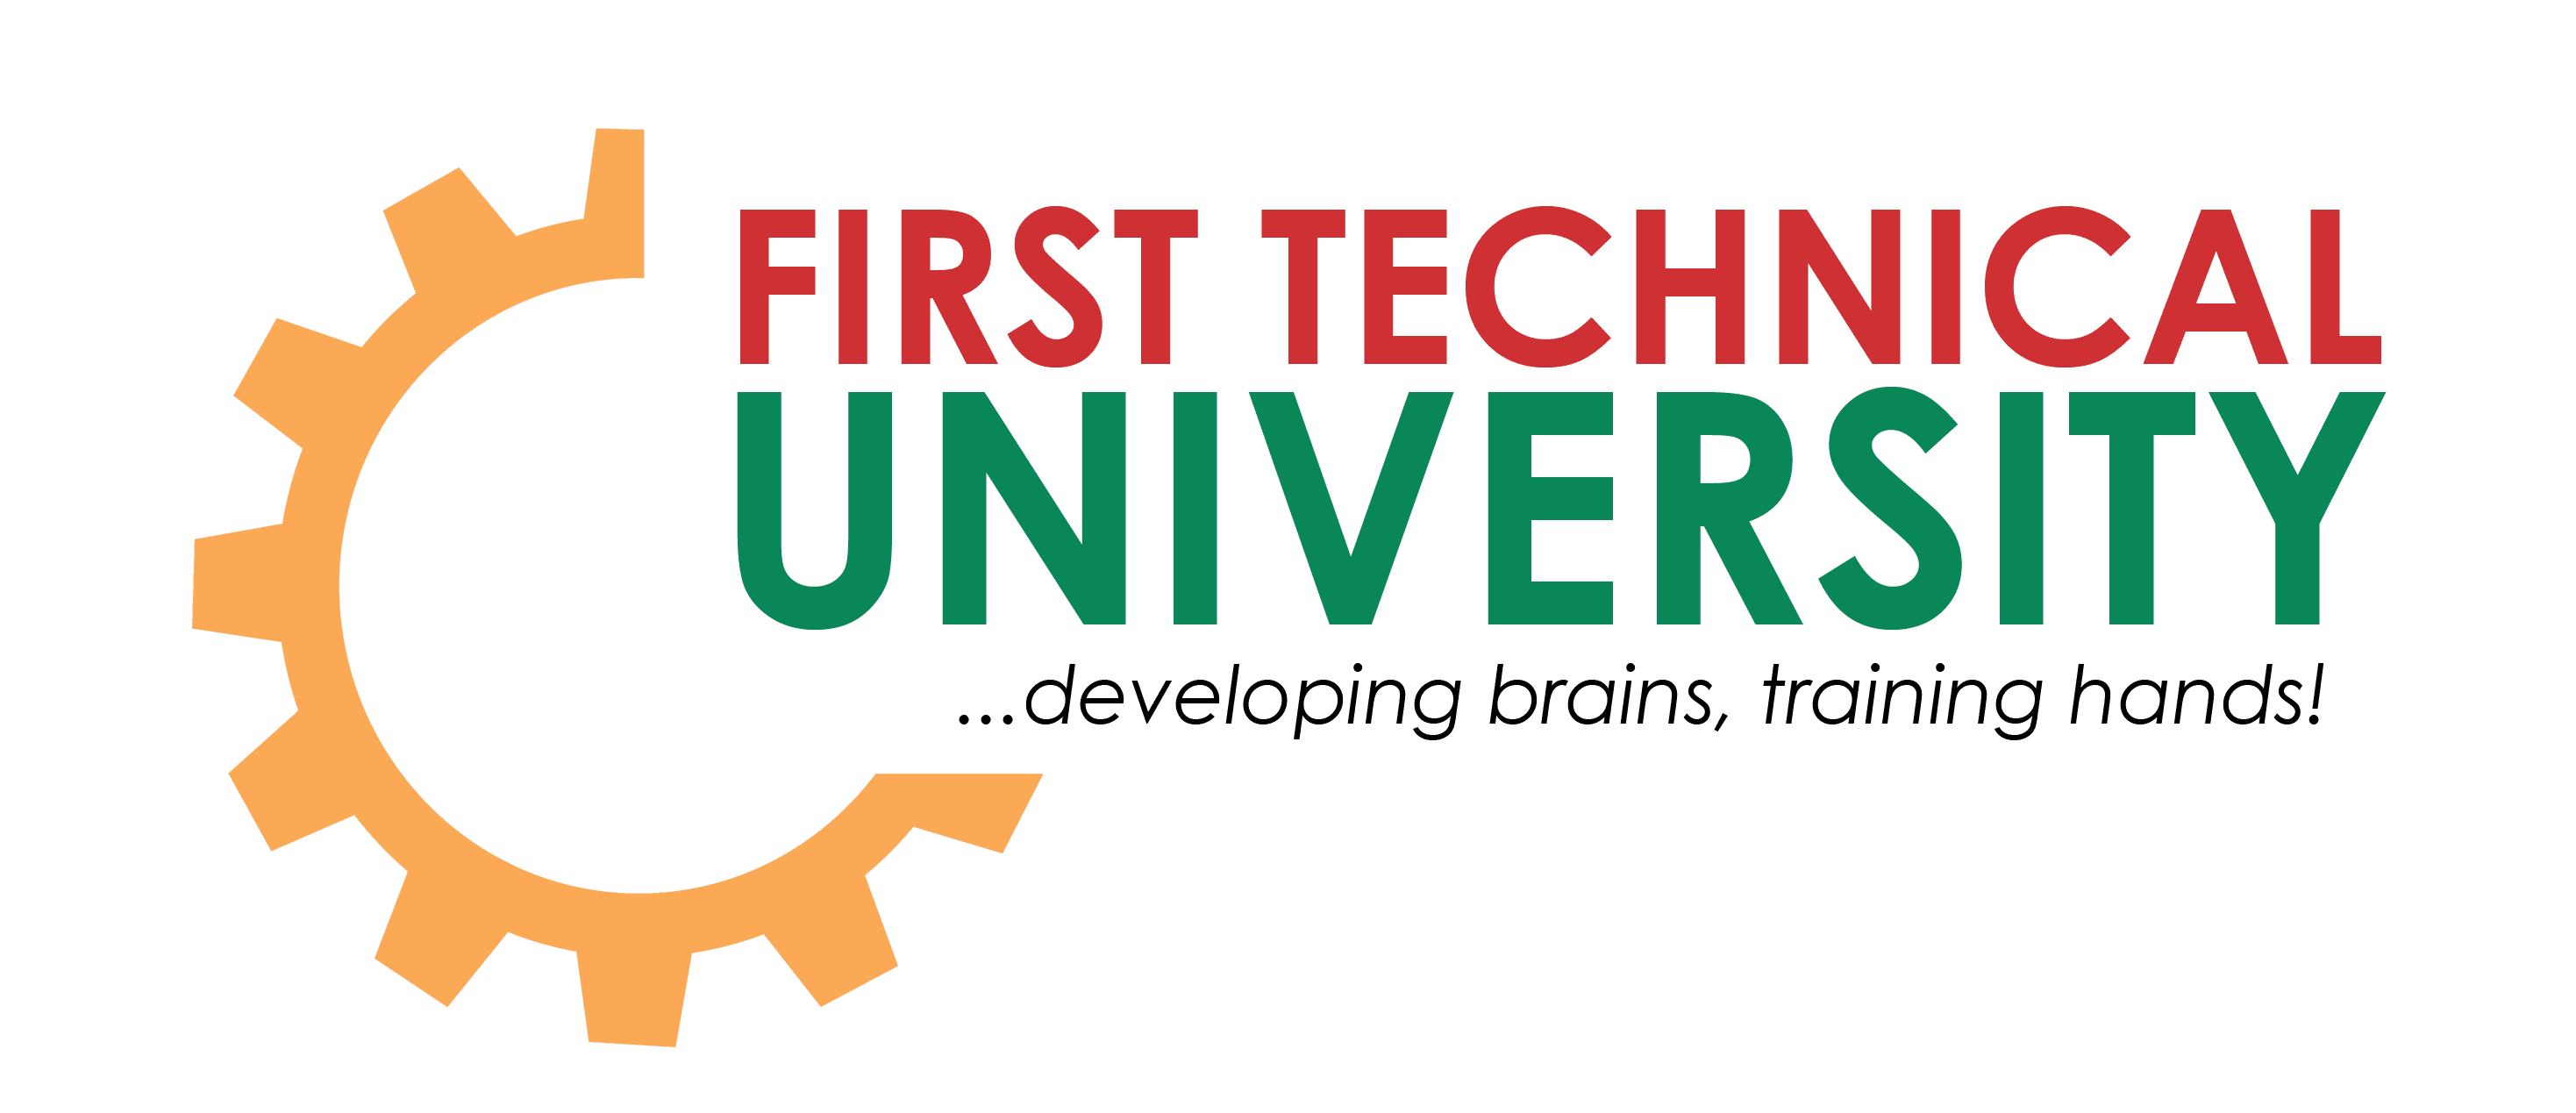 First Technical University logo